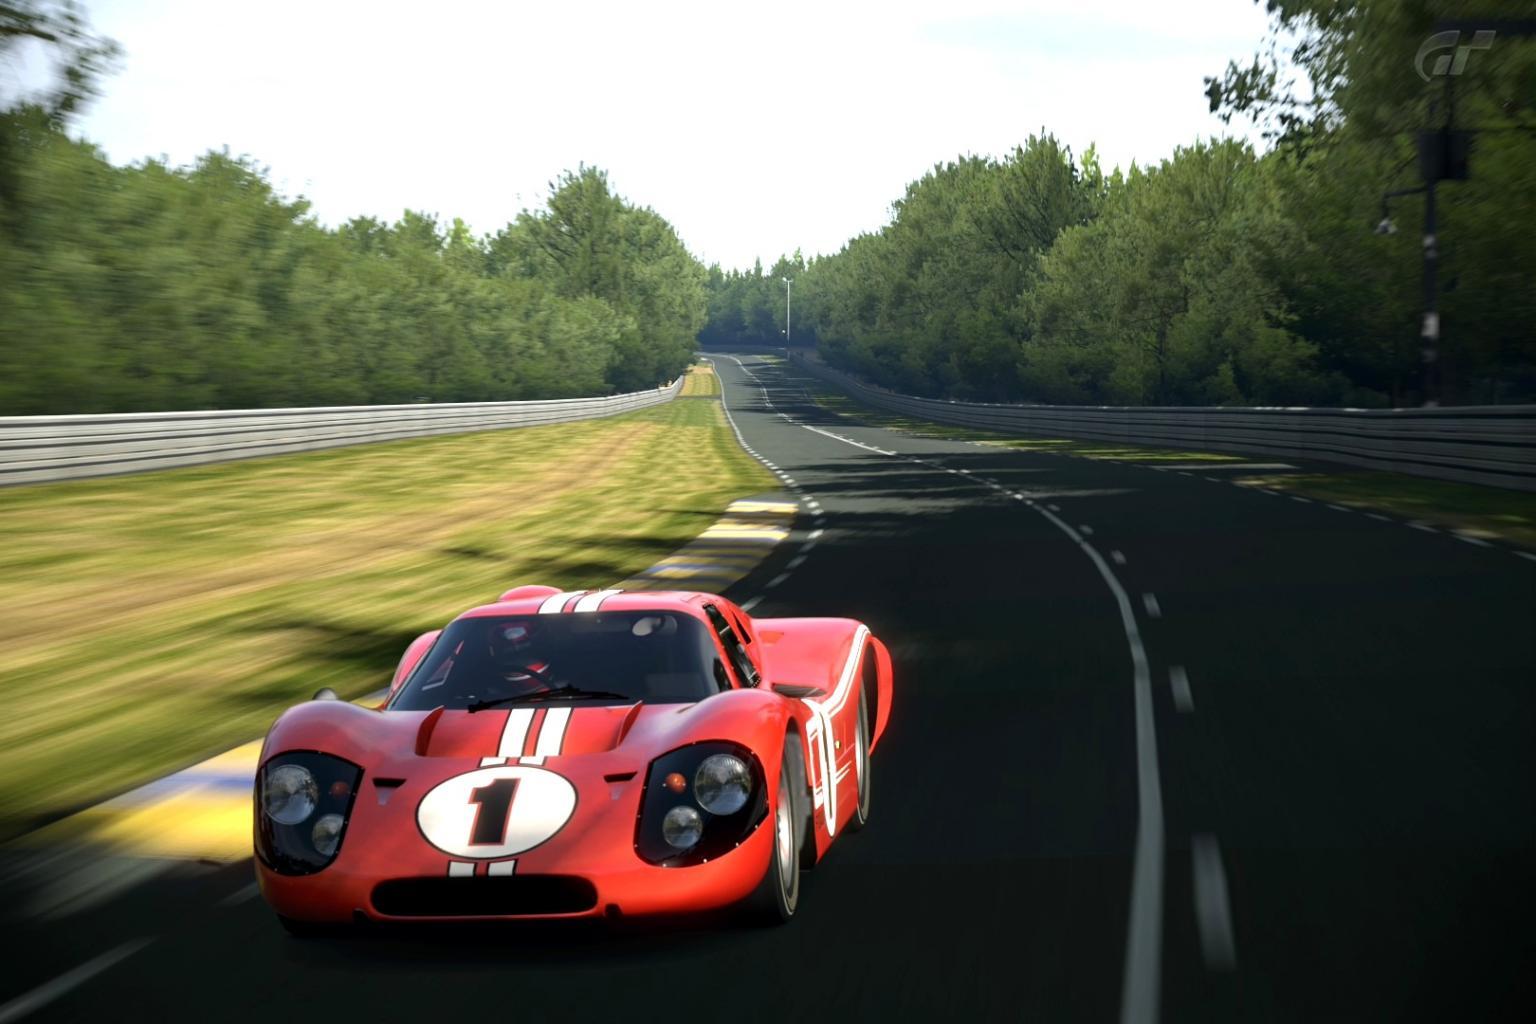 BigB's RCR MKIV-circuit-de-la-sarthe-2005-no-chicanes-jpg